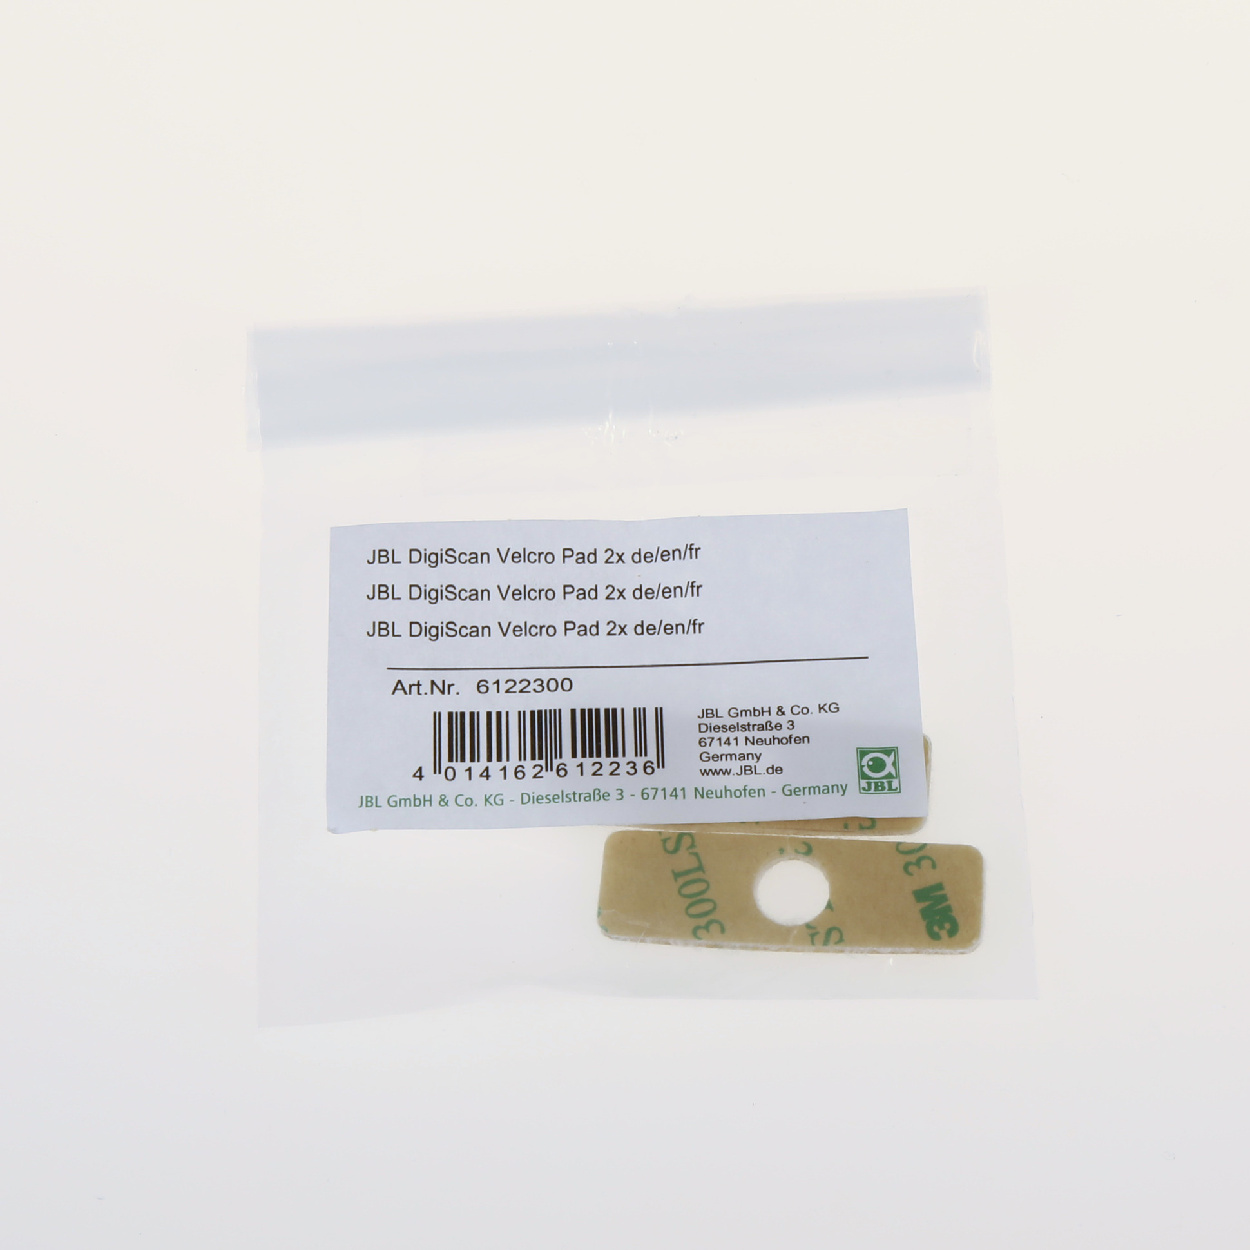 JBL DigiScan Velcro Pad 2x